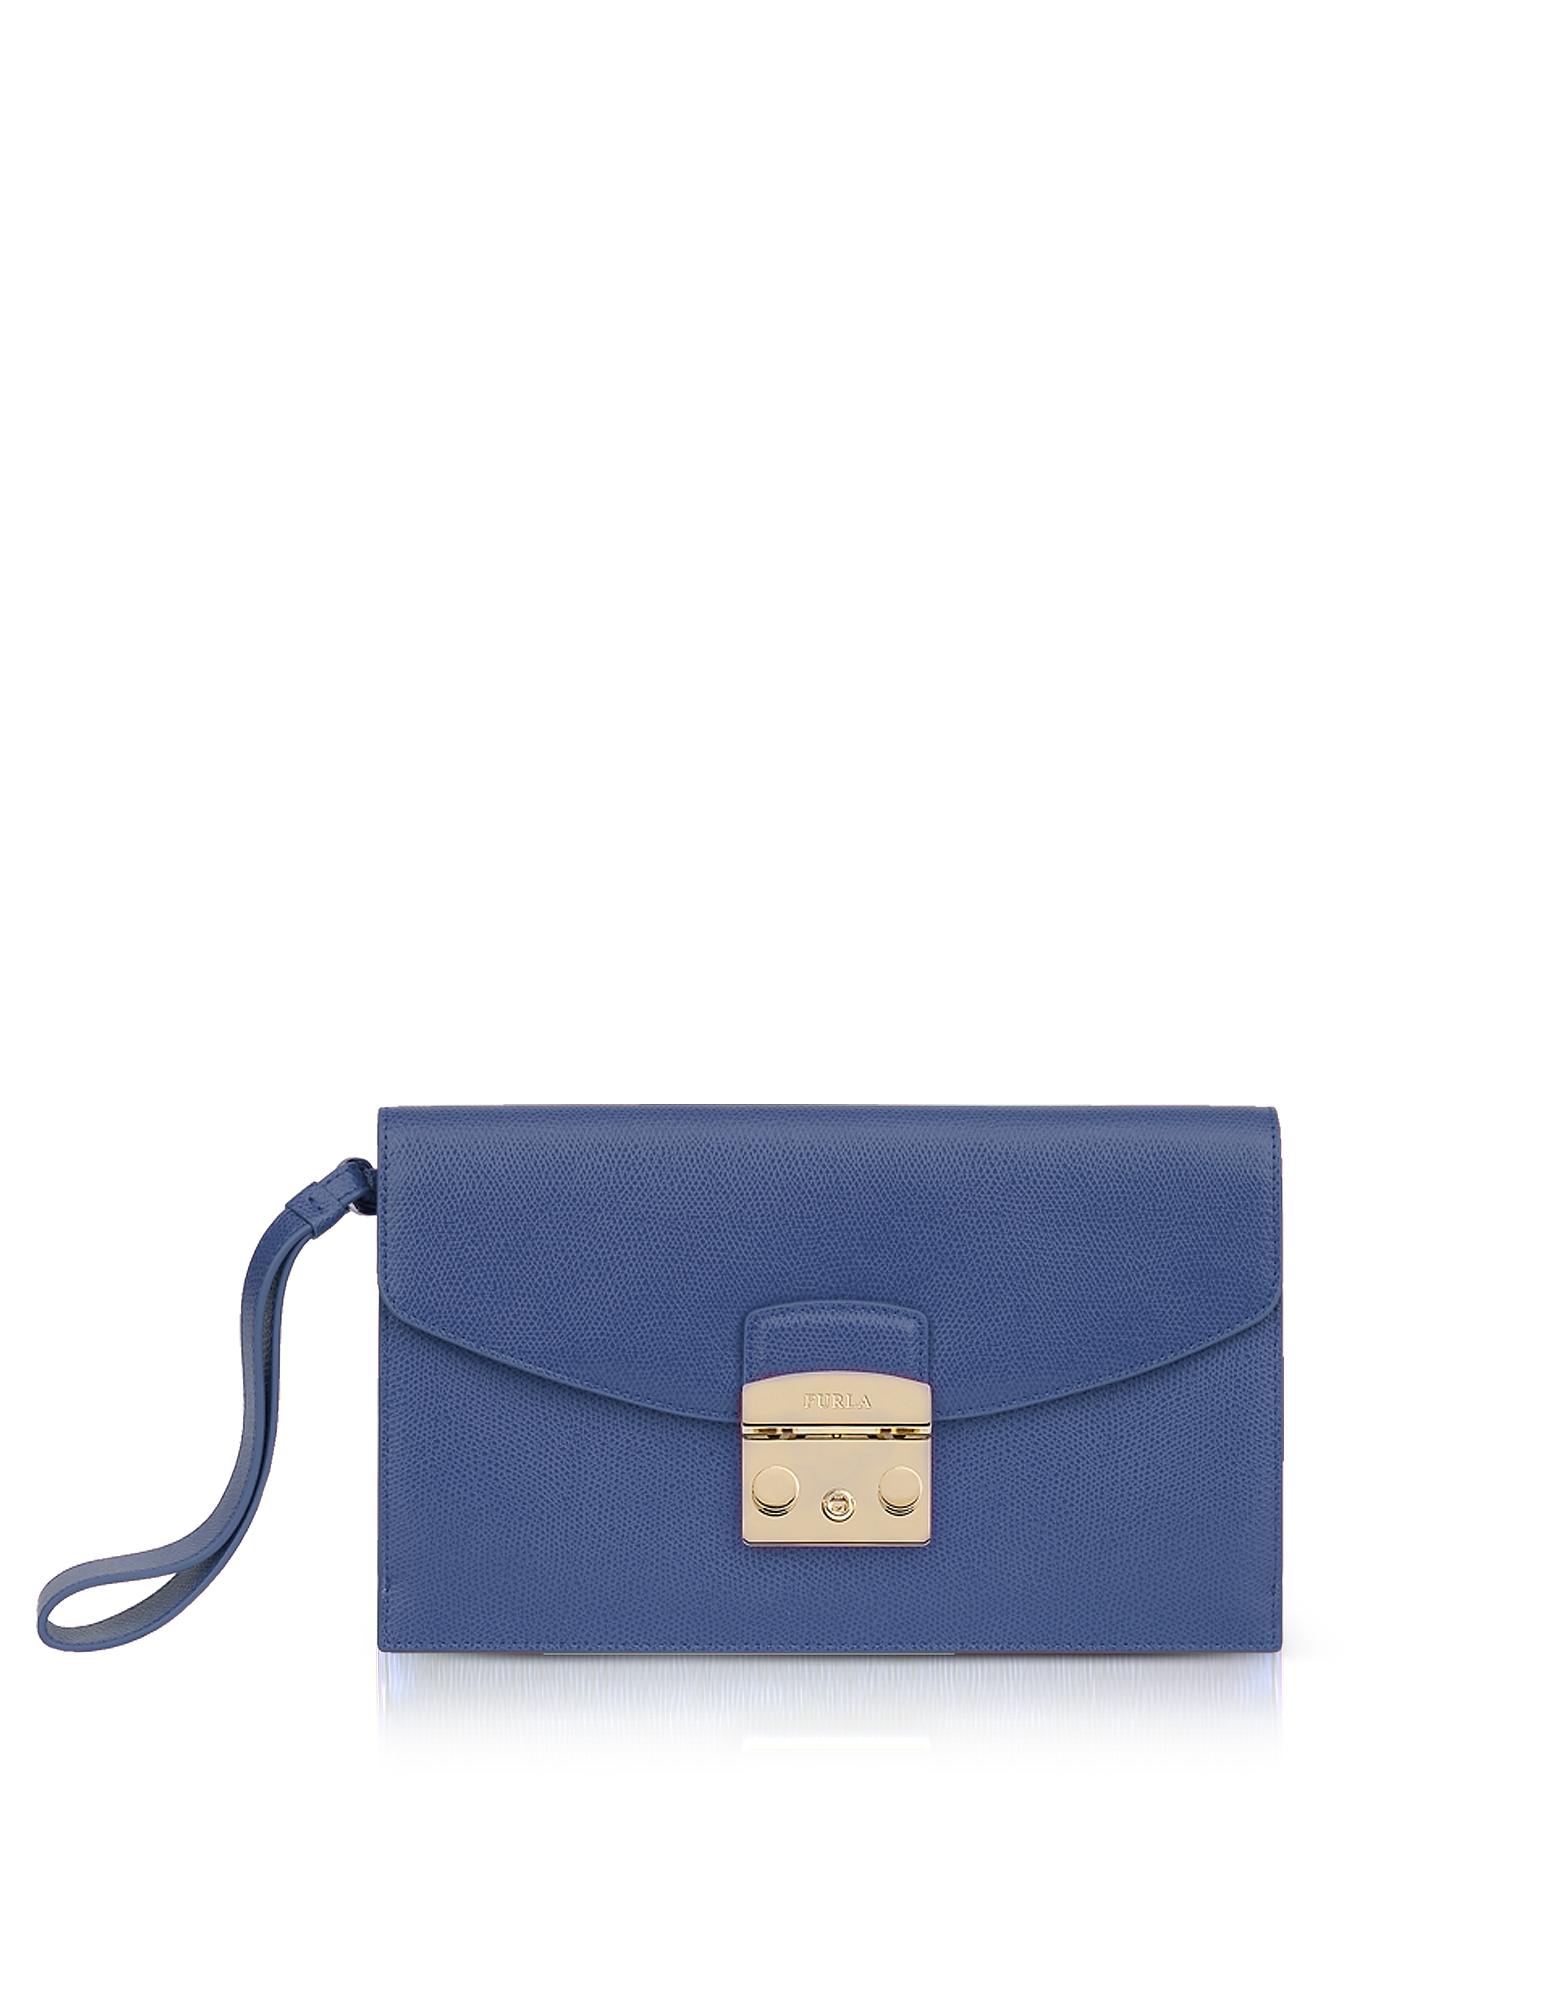 Image of Furla Designer Handbags, Peacock Blue Leather Metropolis Envelope Clutch